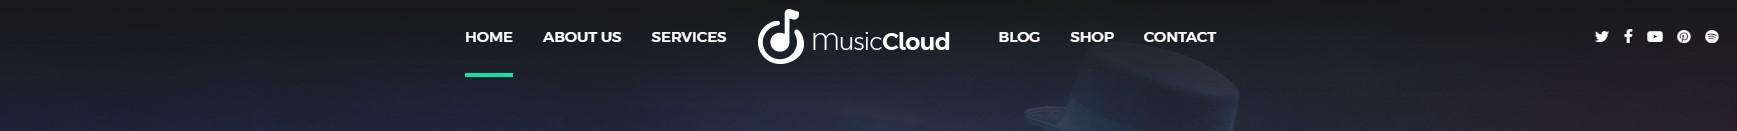 https://documentation.bold-themes.com/music-club/wp-content/uploads/sites/19/2017/06/menu-horizontal-center.jpg